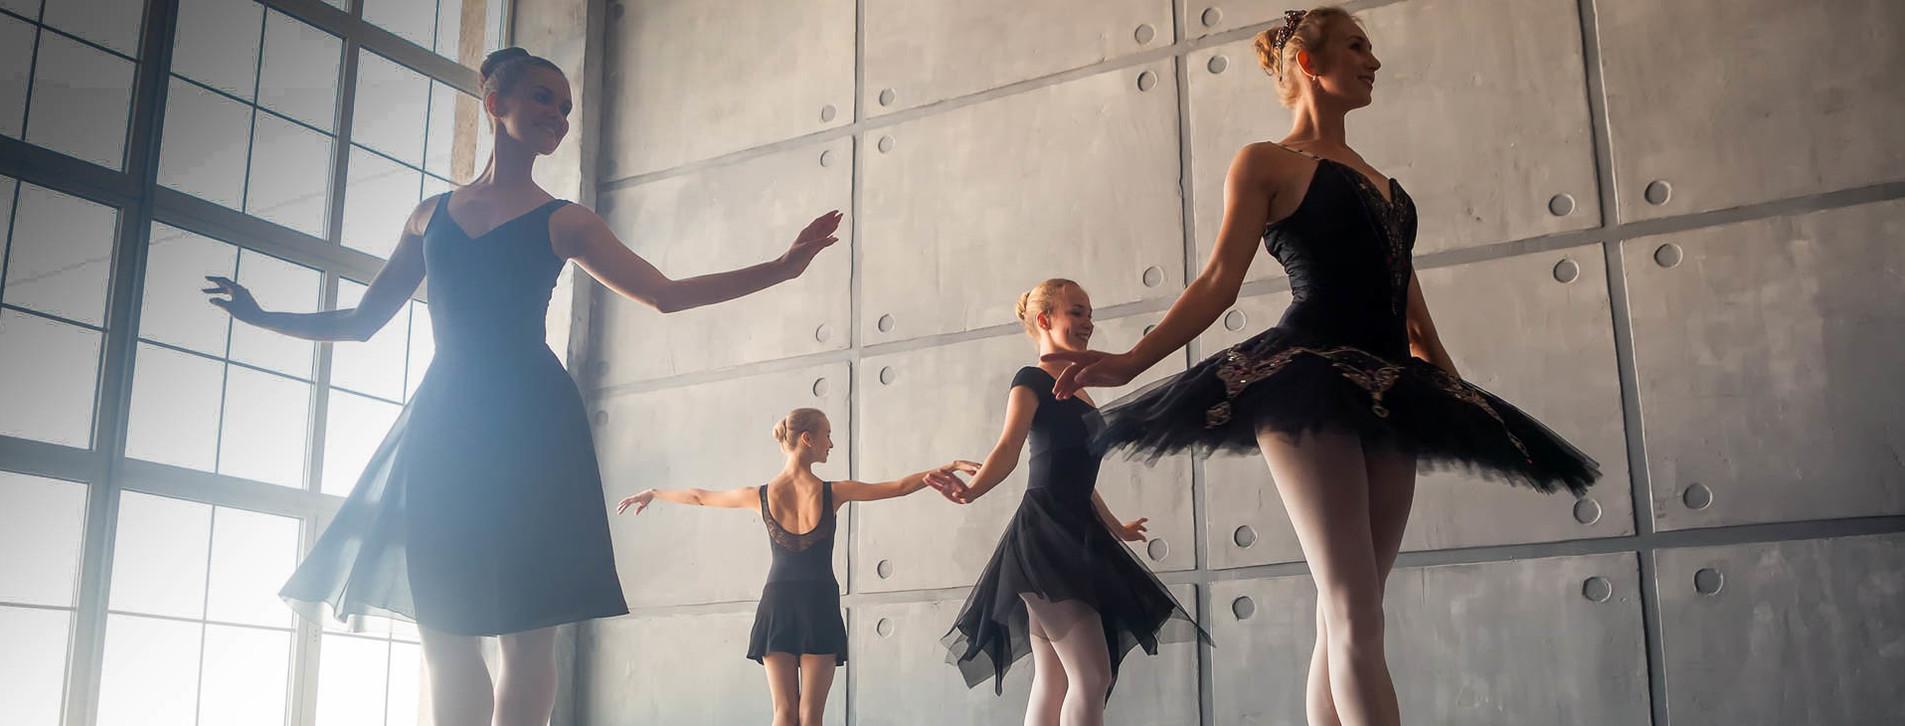 Фото 1 - Курс балета